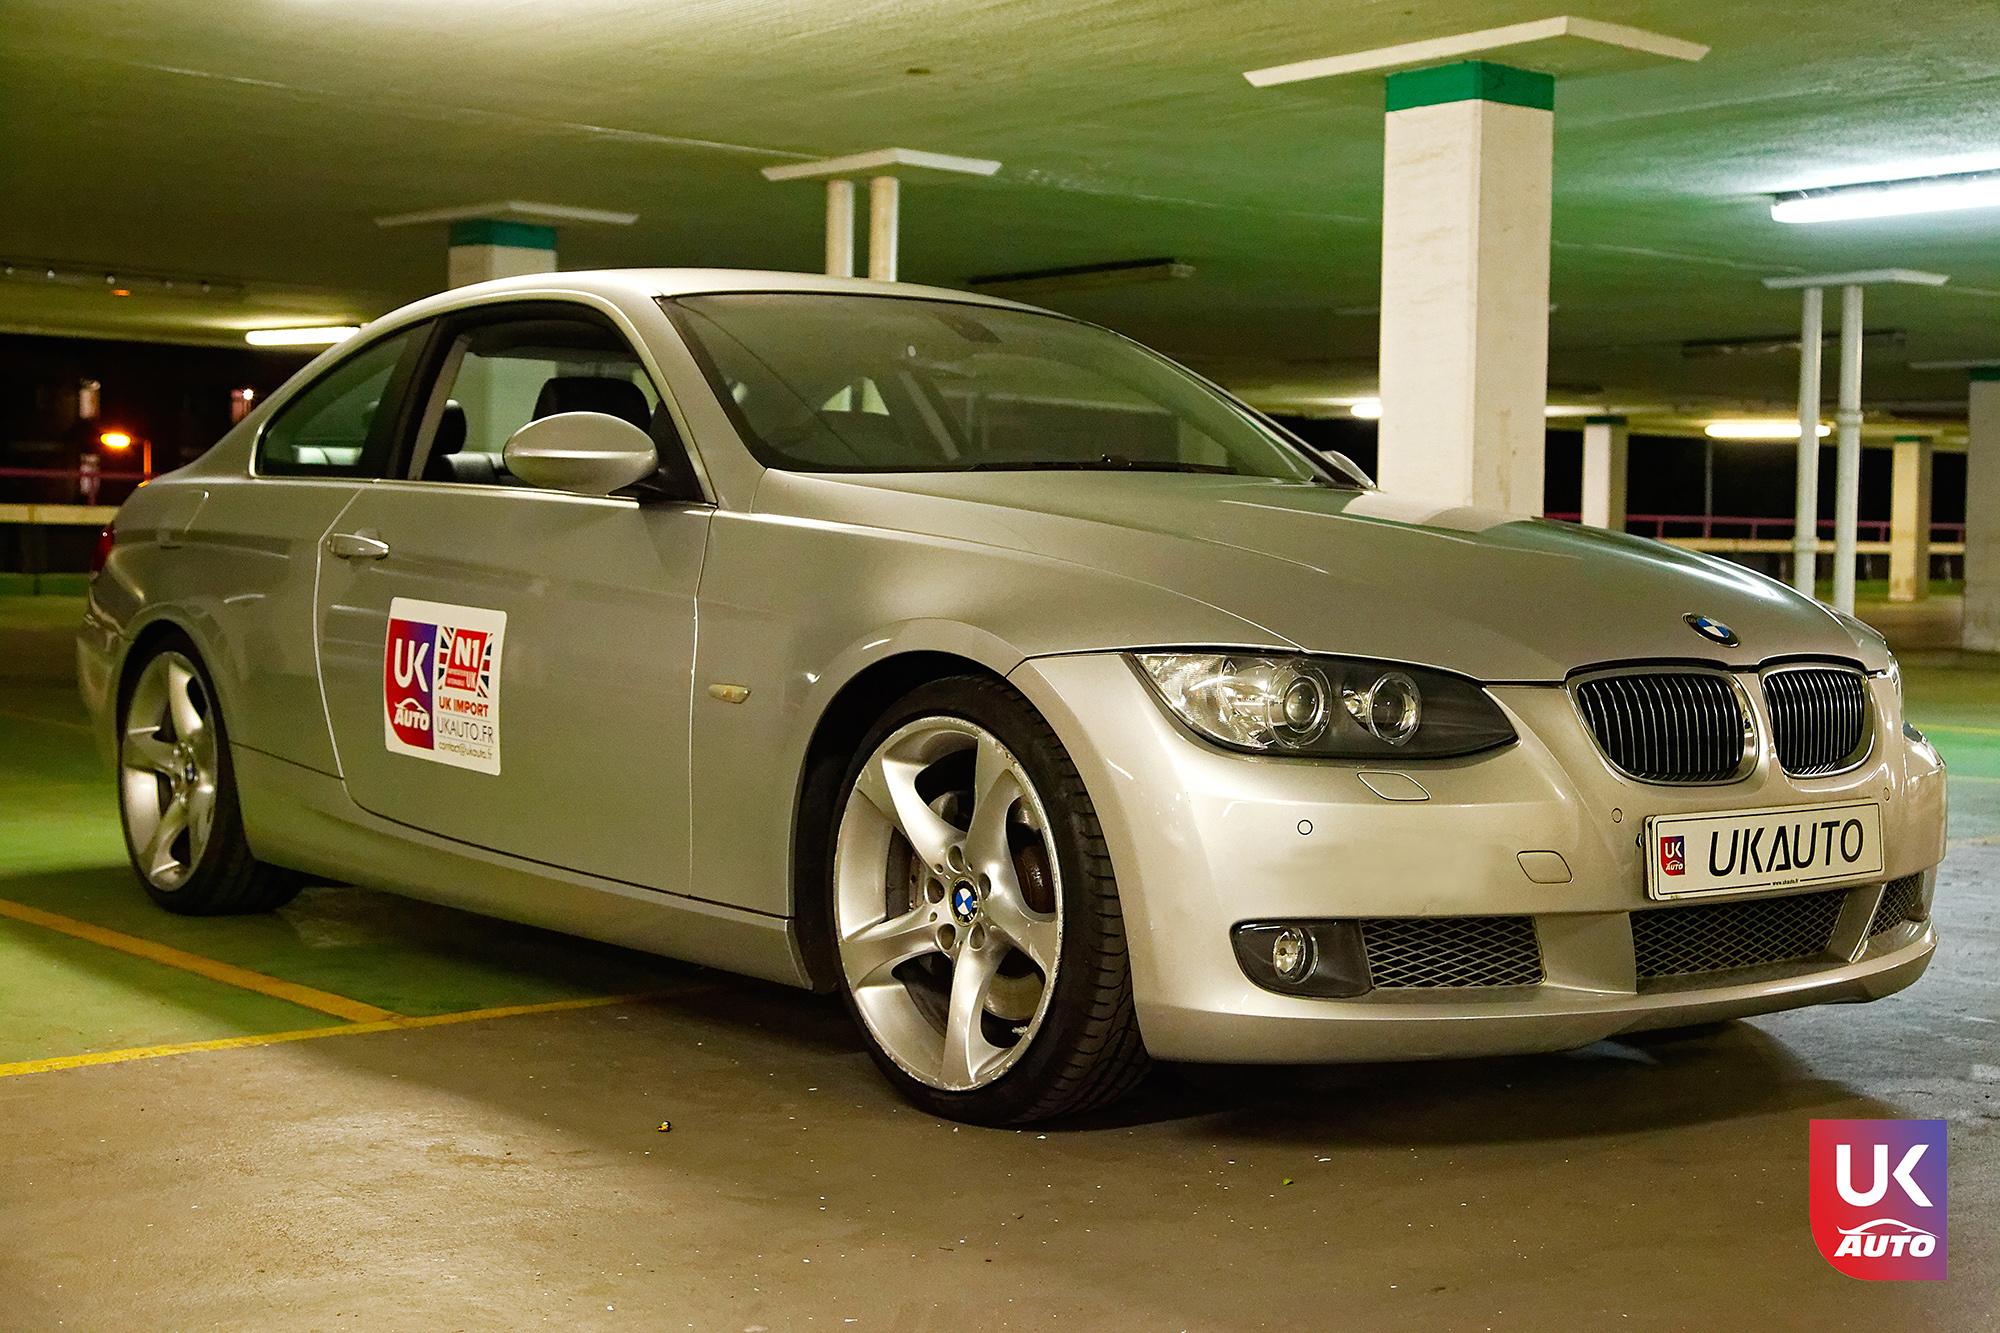 Bmw 335i rhd import uk bmw occasion bmw mandataire e92 rhd coupe uk auto uk ukauto1 - Felecitation a Julien pour cette BMW 335i E92 COUPE RHD importateur voitures anglaises